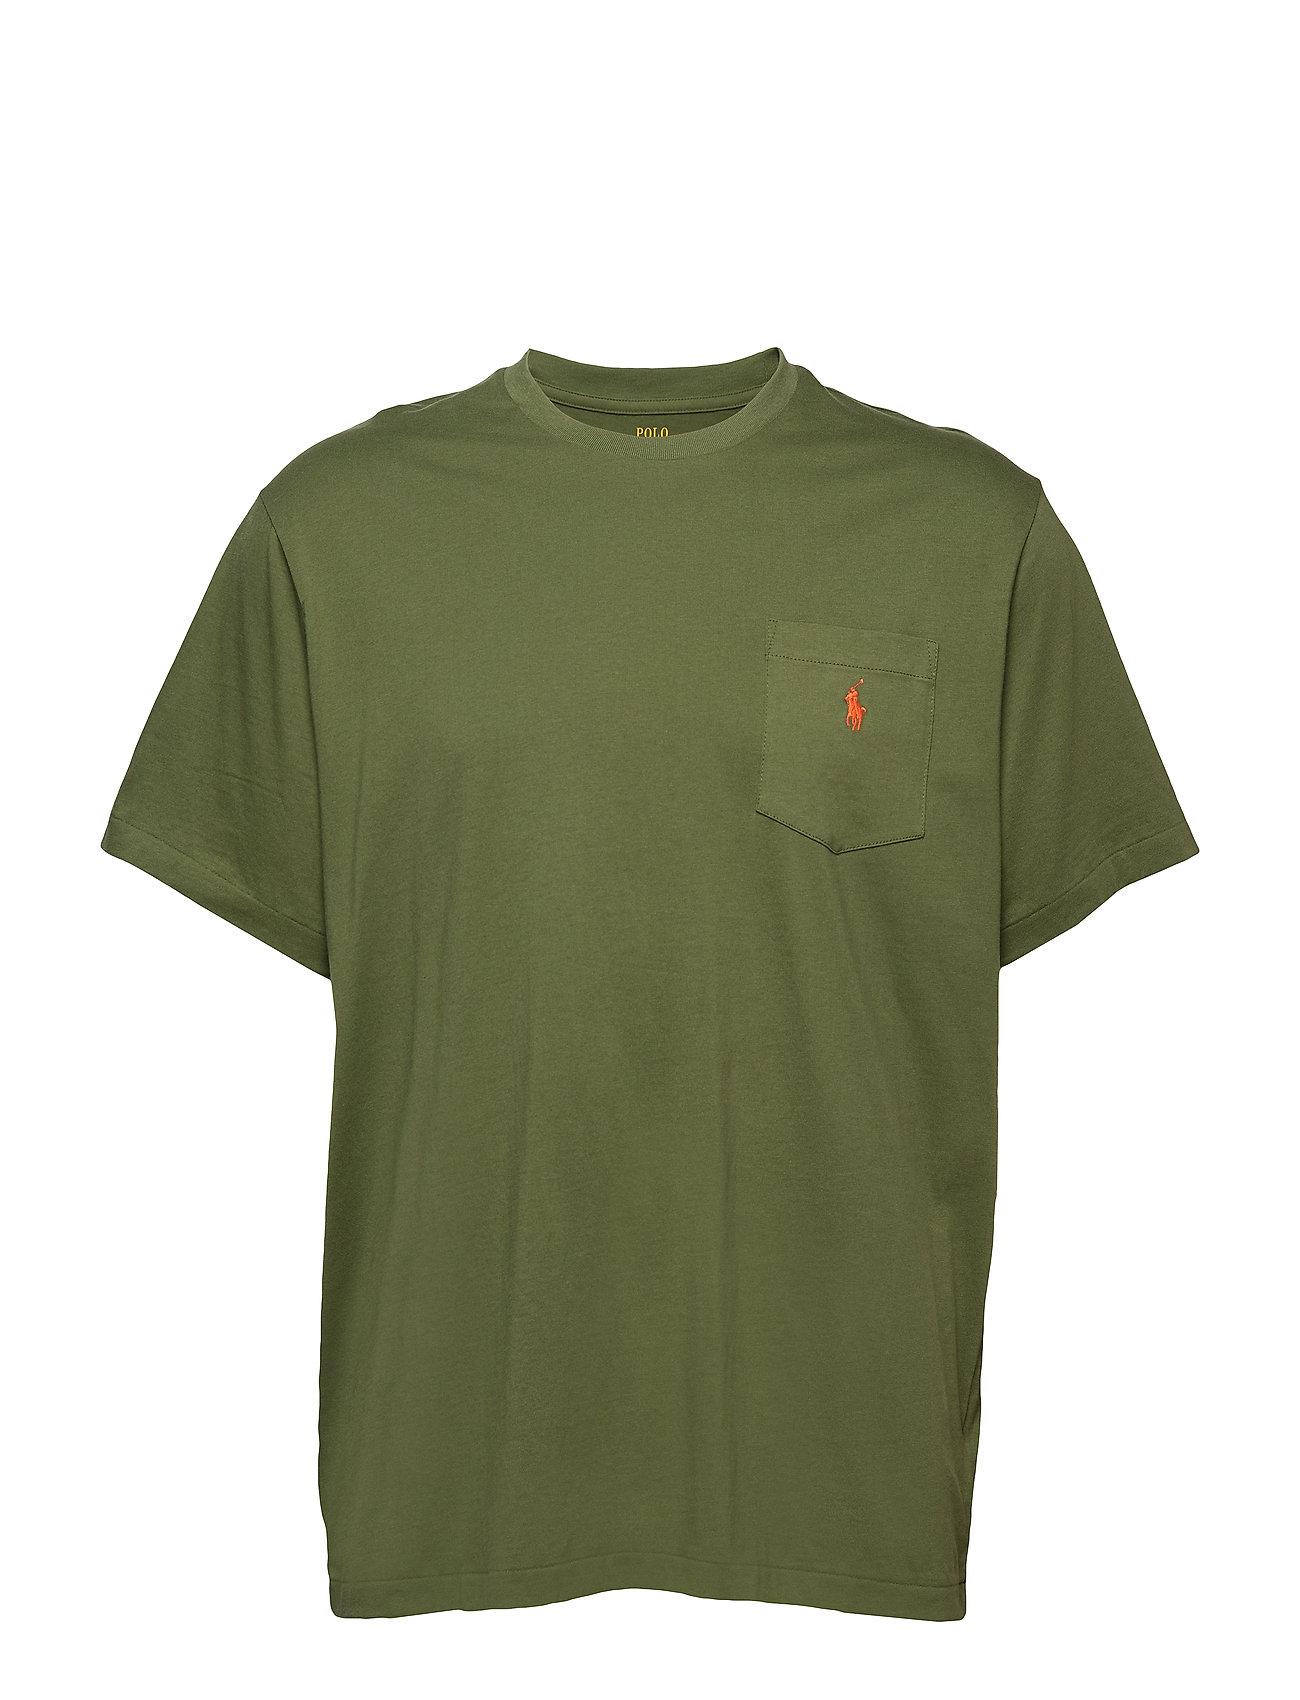 Polo Ralph Lauren Big & Tall Classic Fit Pocket T Shirt Ögrönlar